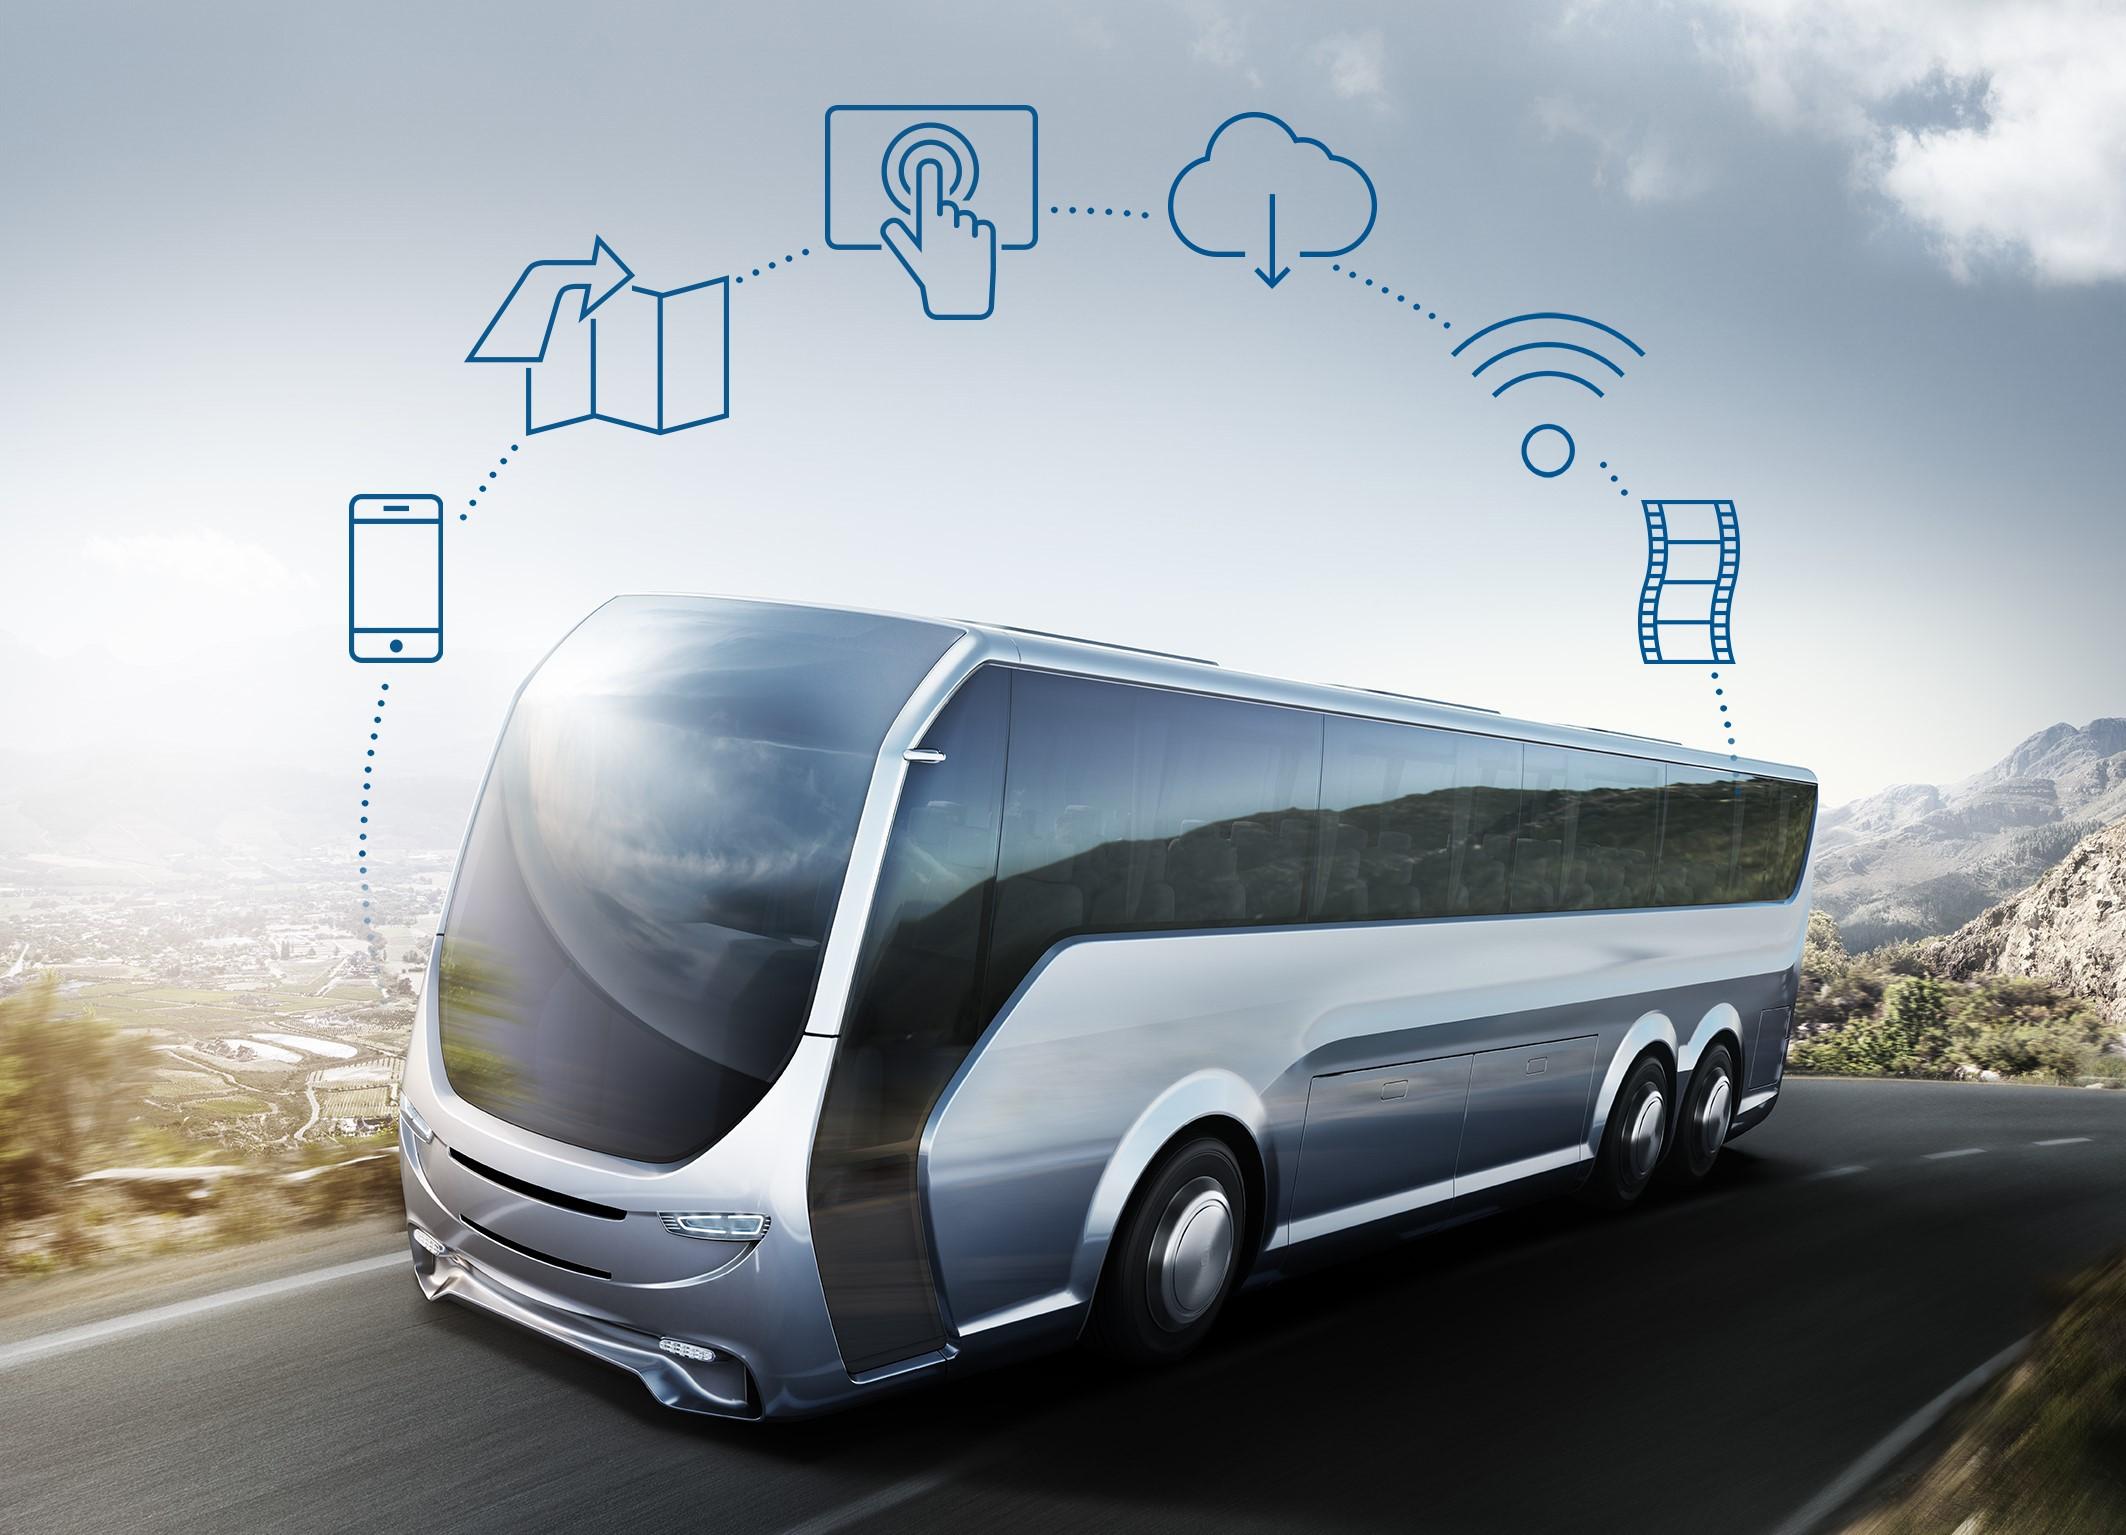 Bosch maakt entertainmentcenters van passagierscompartimenten in bussen